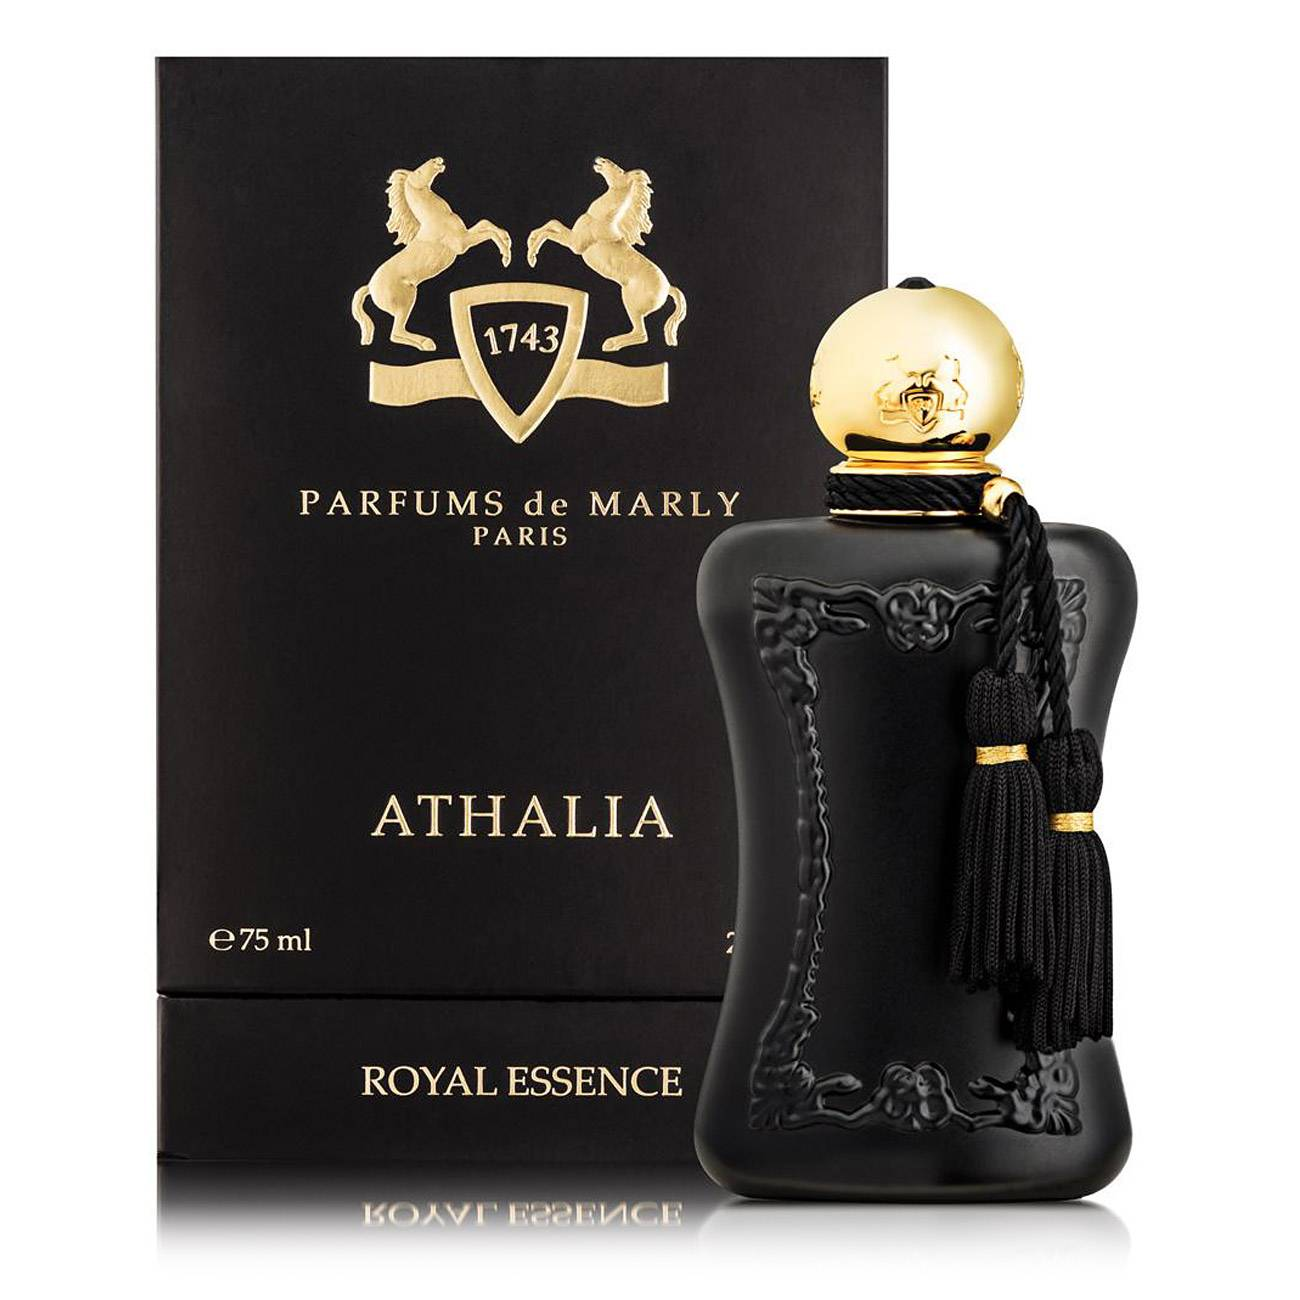 ATHALIA 75ml imagine produs